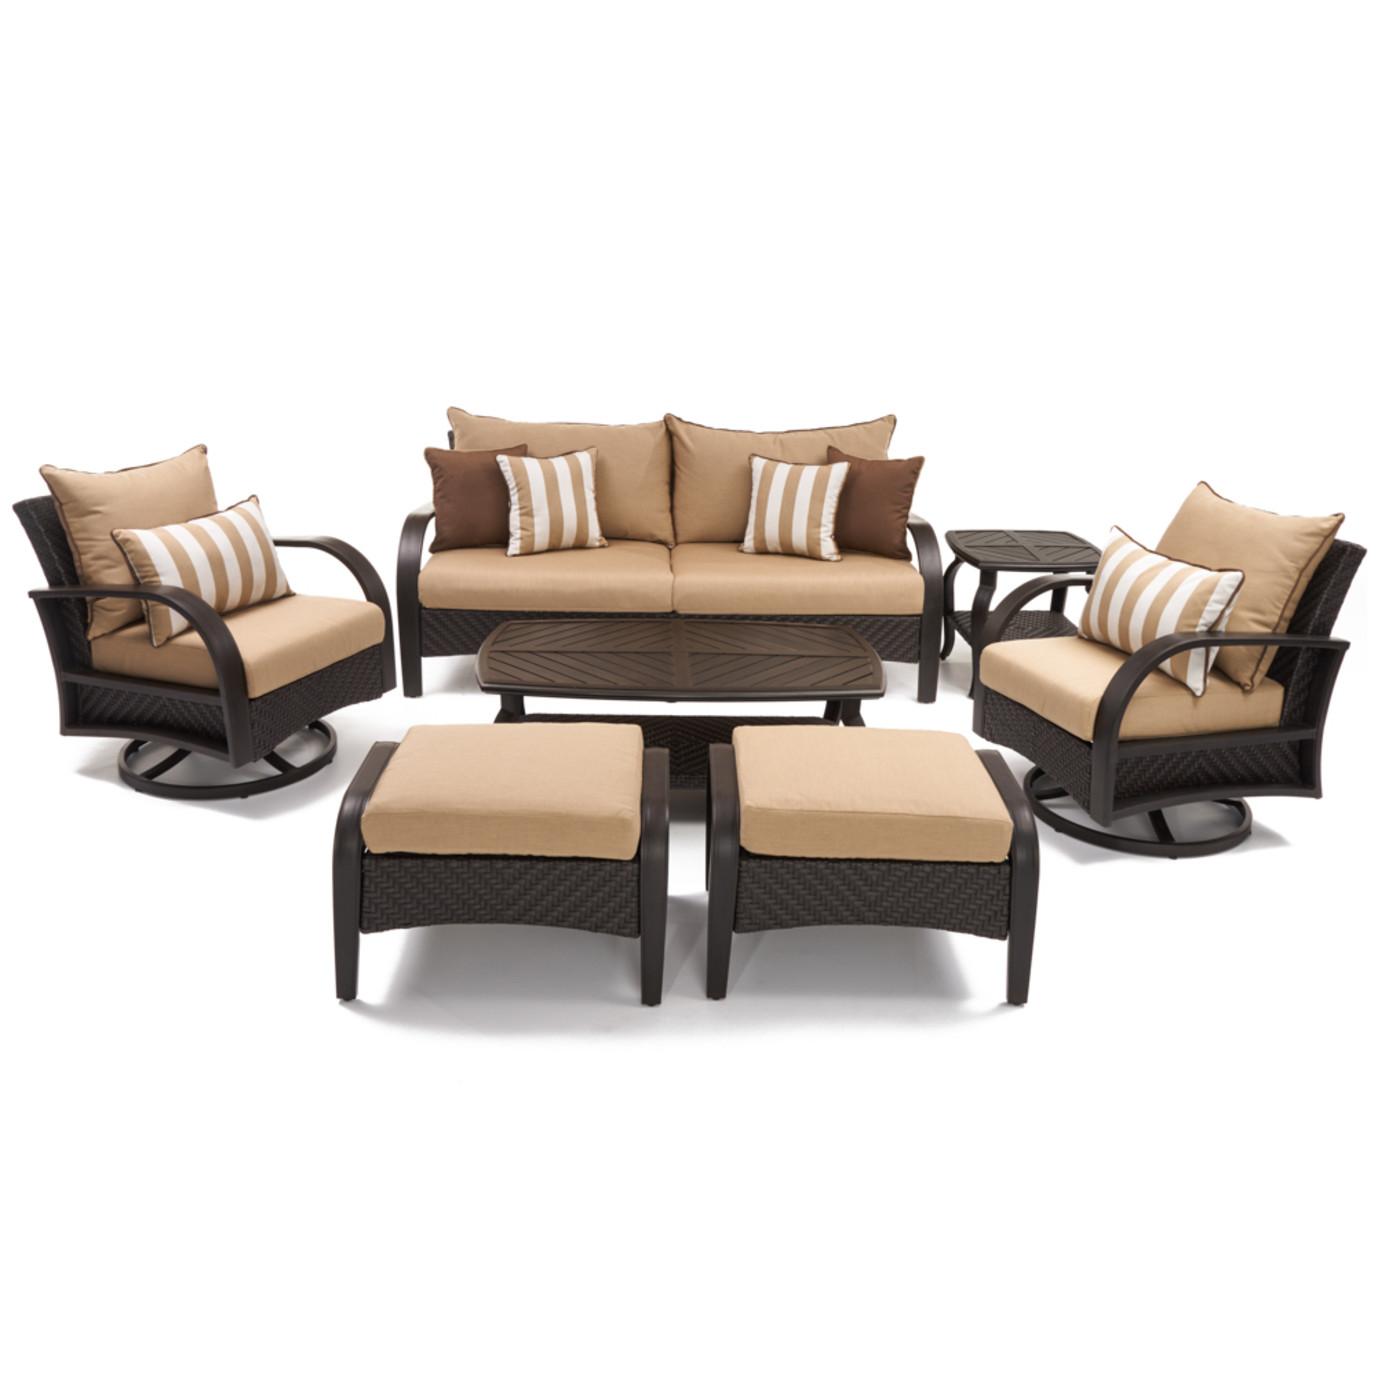 Barcelo™ 7 Piece Motion Club Deep Seating Set - Maxim Beige